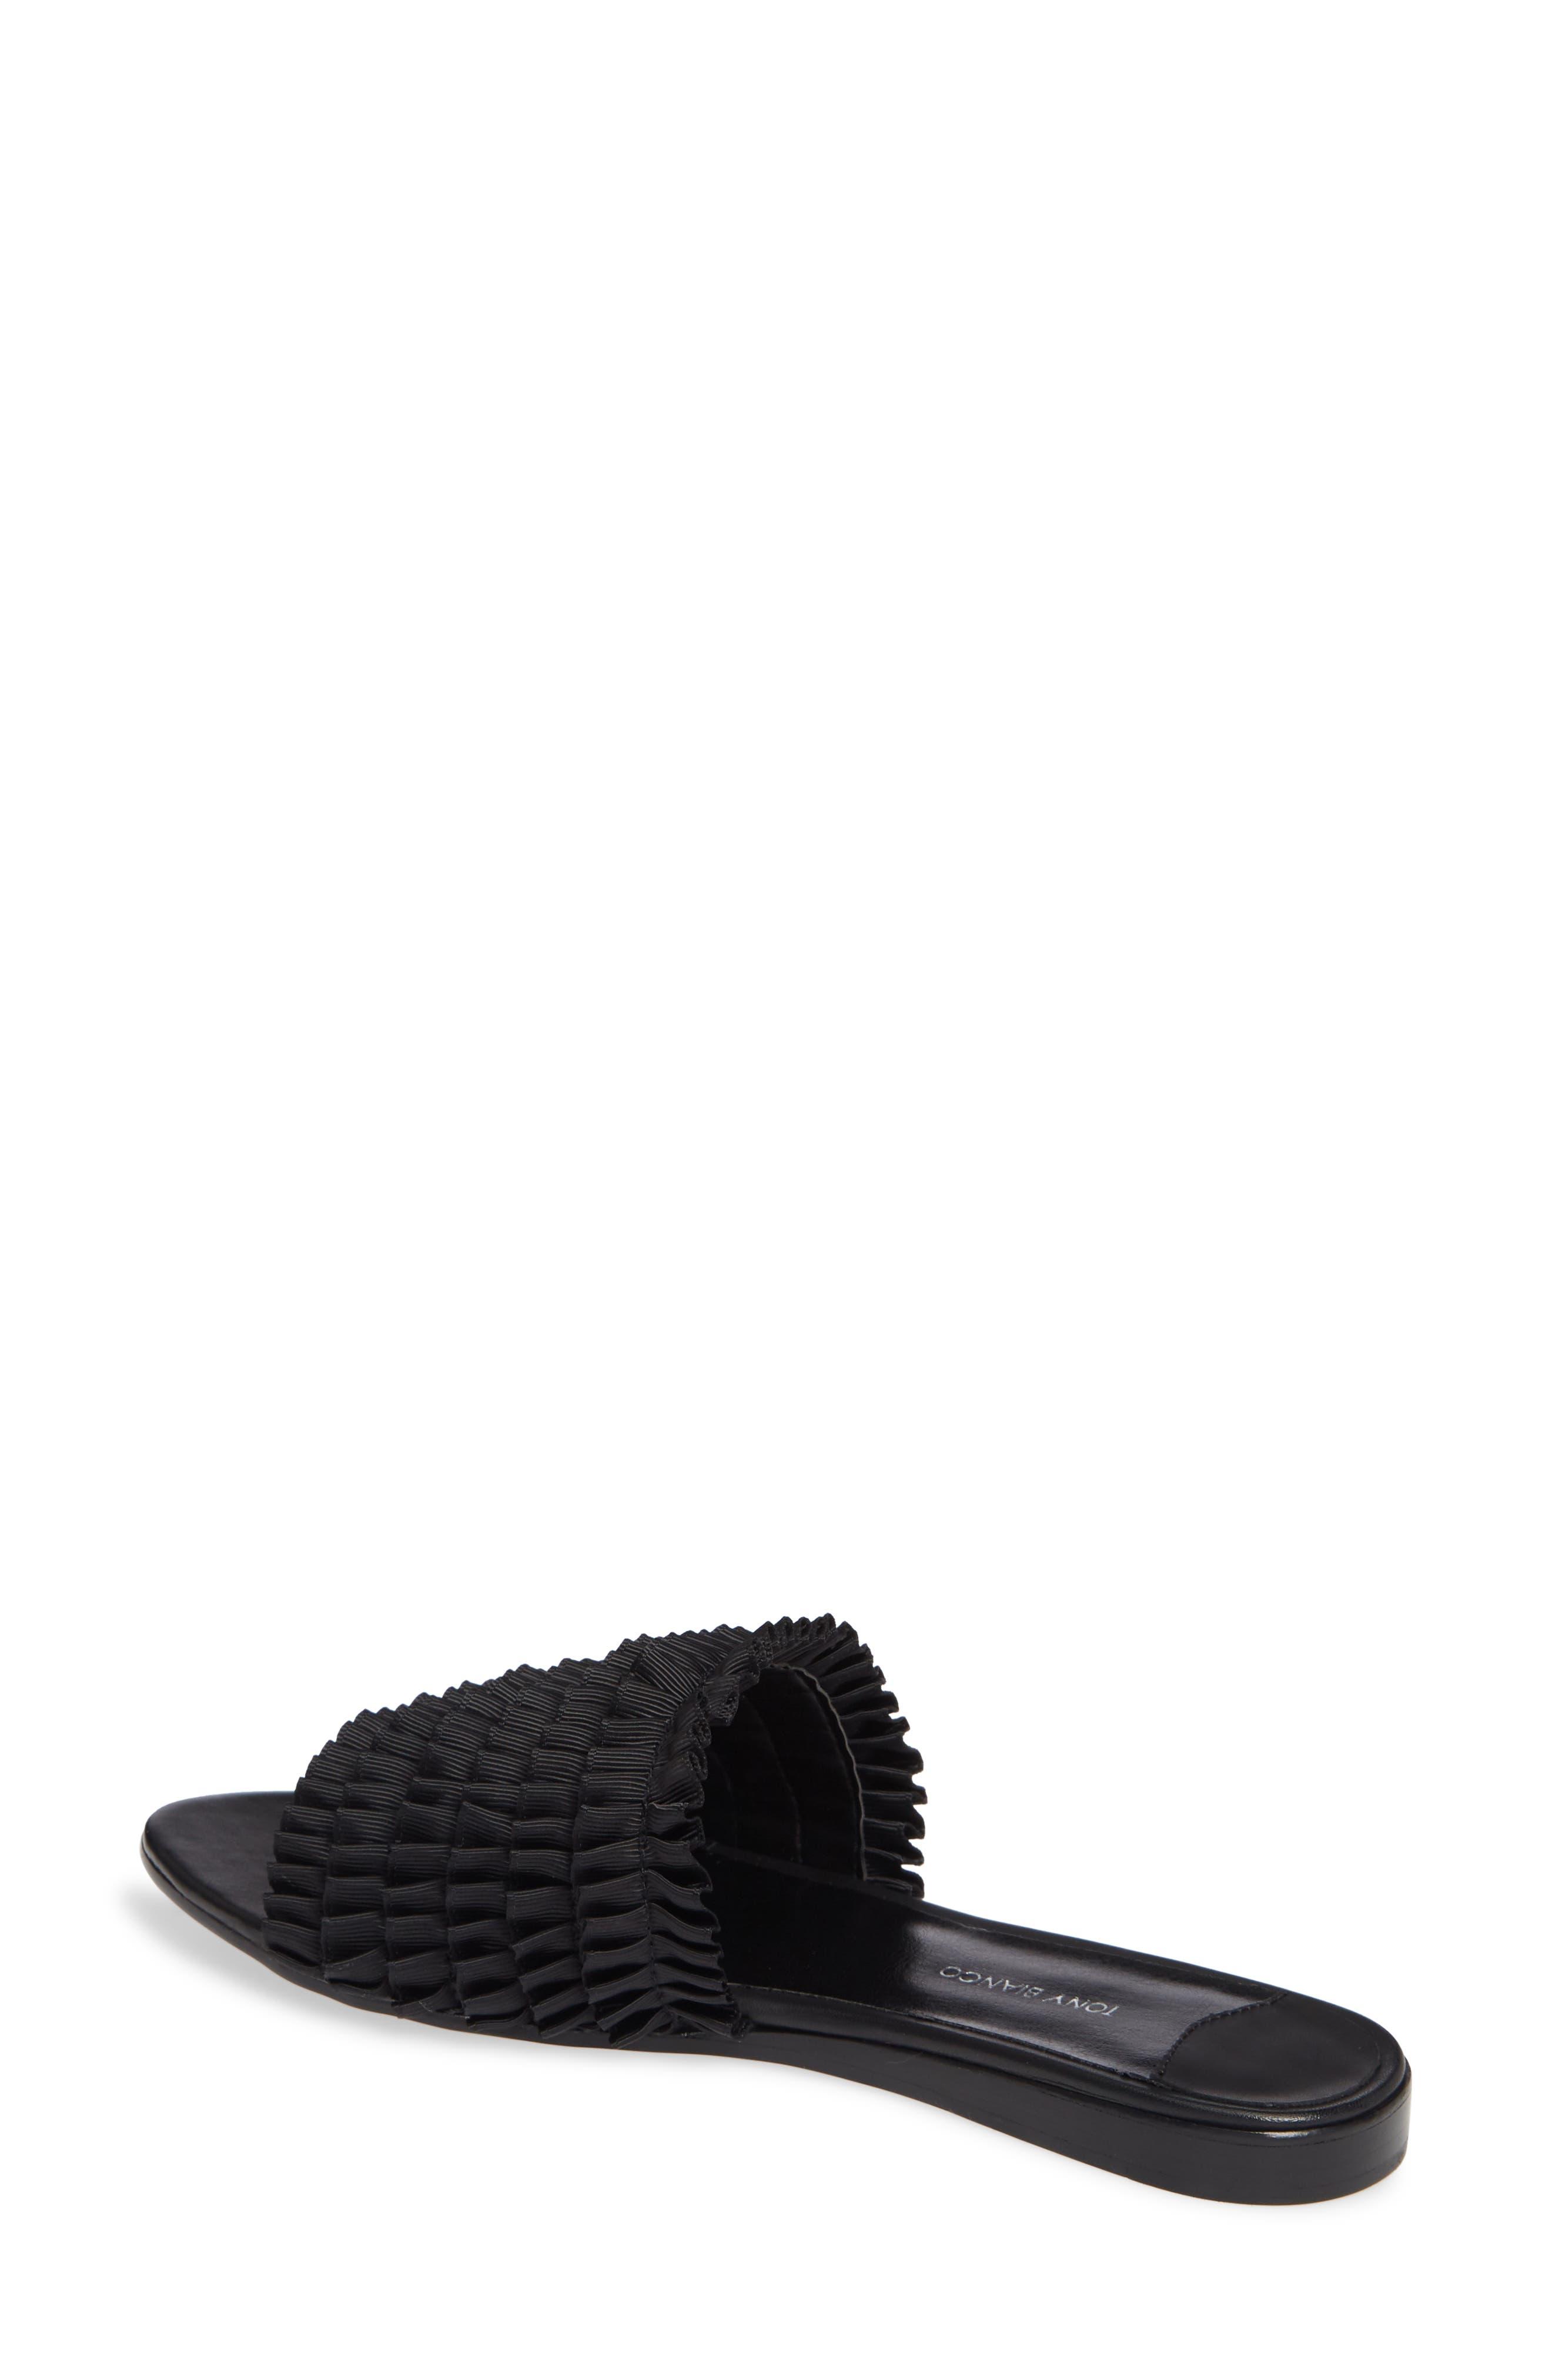 Jerzy Slide Sandal,                             Alternate thumbnail 2, color,                             BLACK FABRIC